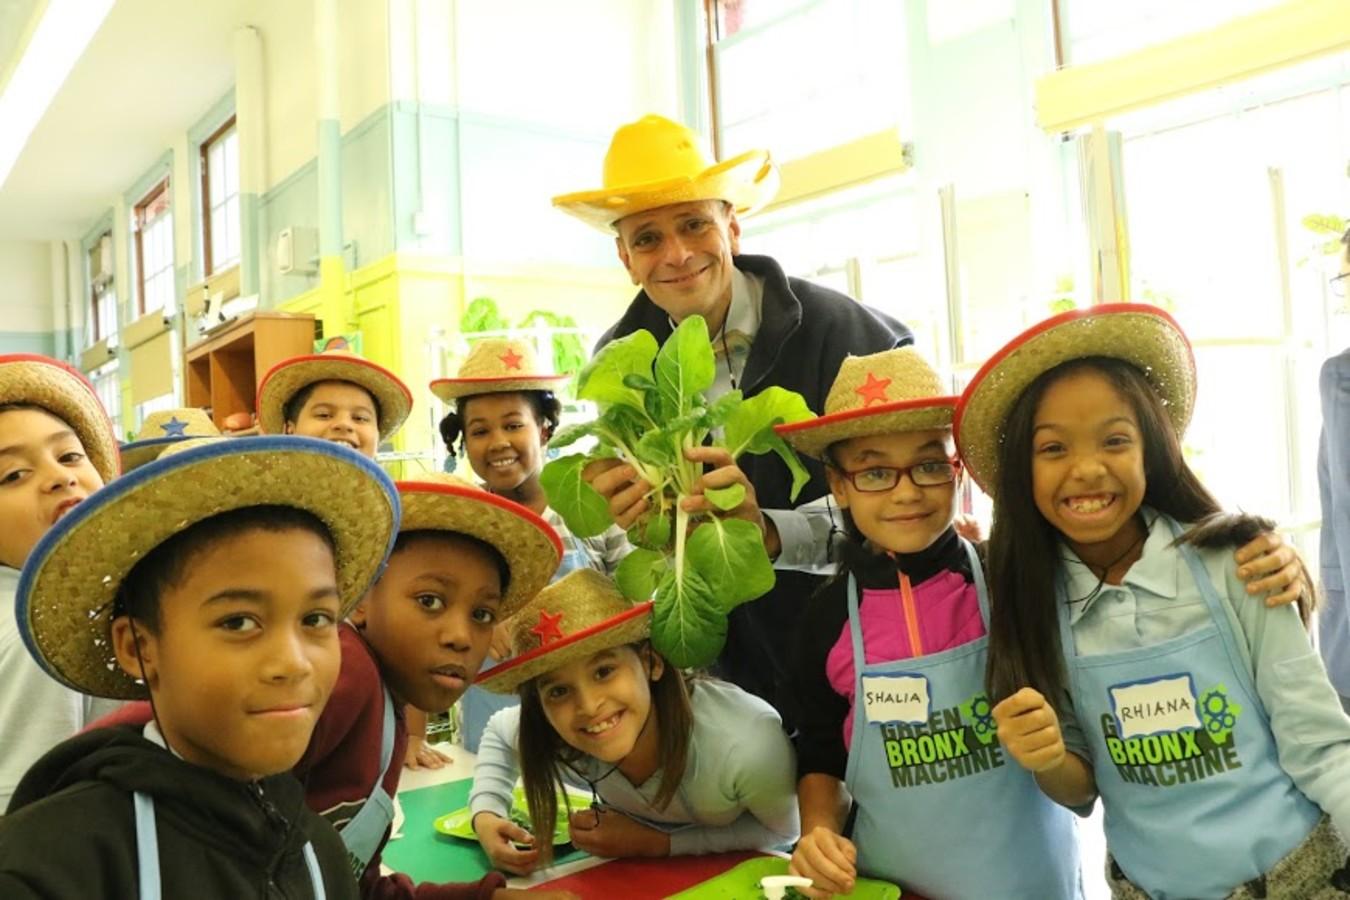 Stephen Ritz and Kids